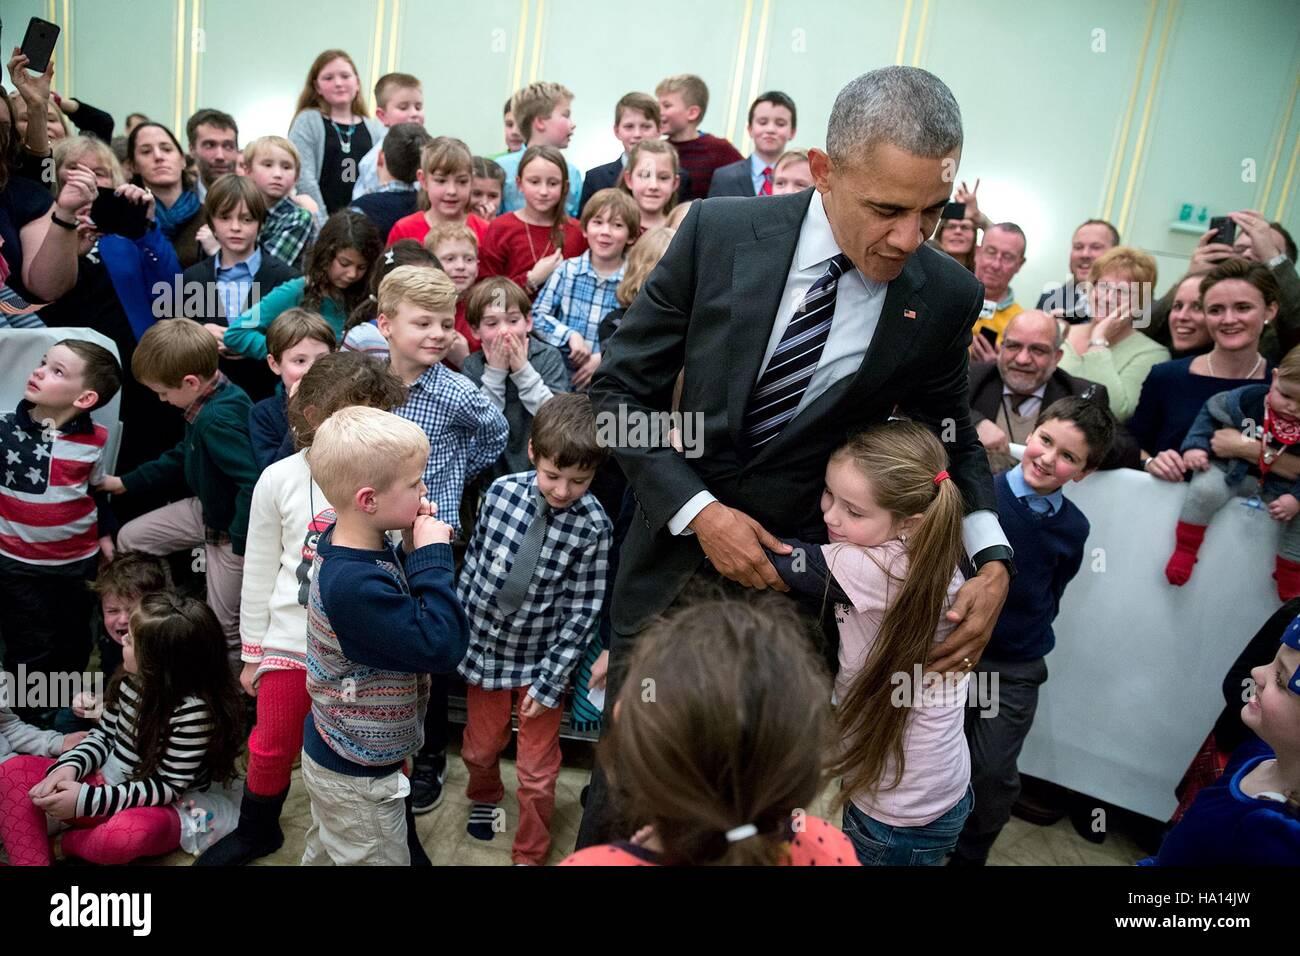 Us president barack obama greets children during the us embassy us president barack obama greets children during the us embassy meet and greet at hotel adlon november 16 2016 in berlin germany m4hsunfo